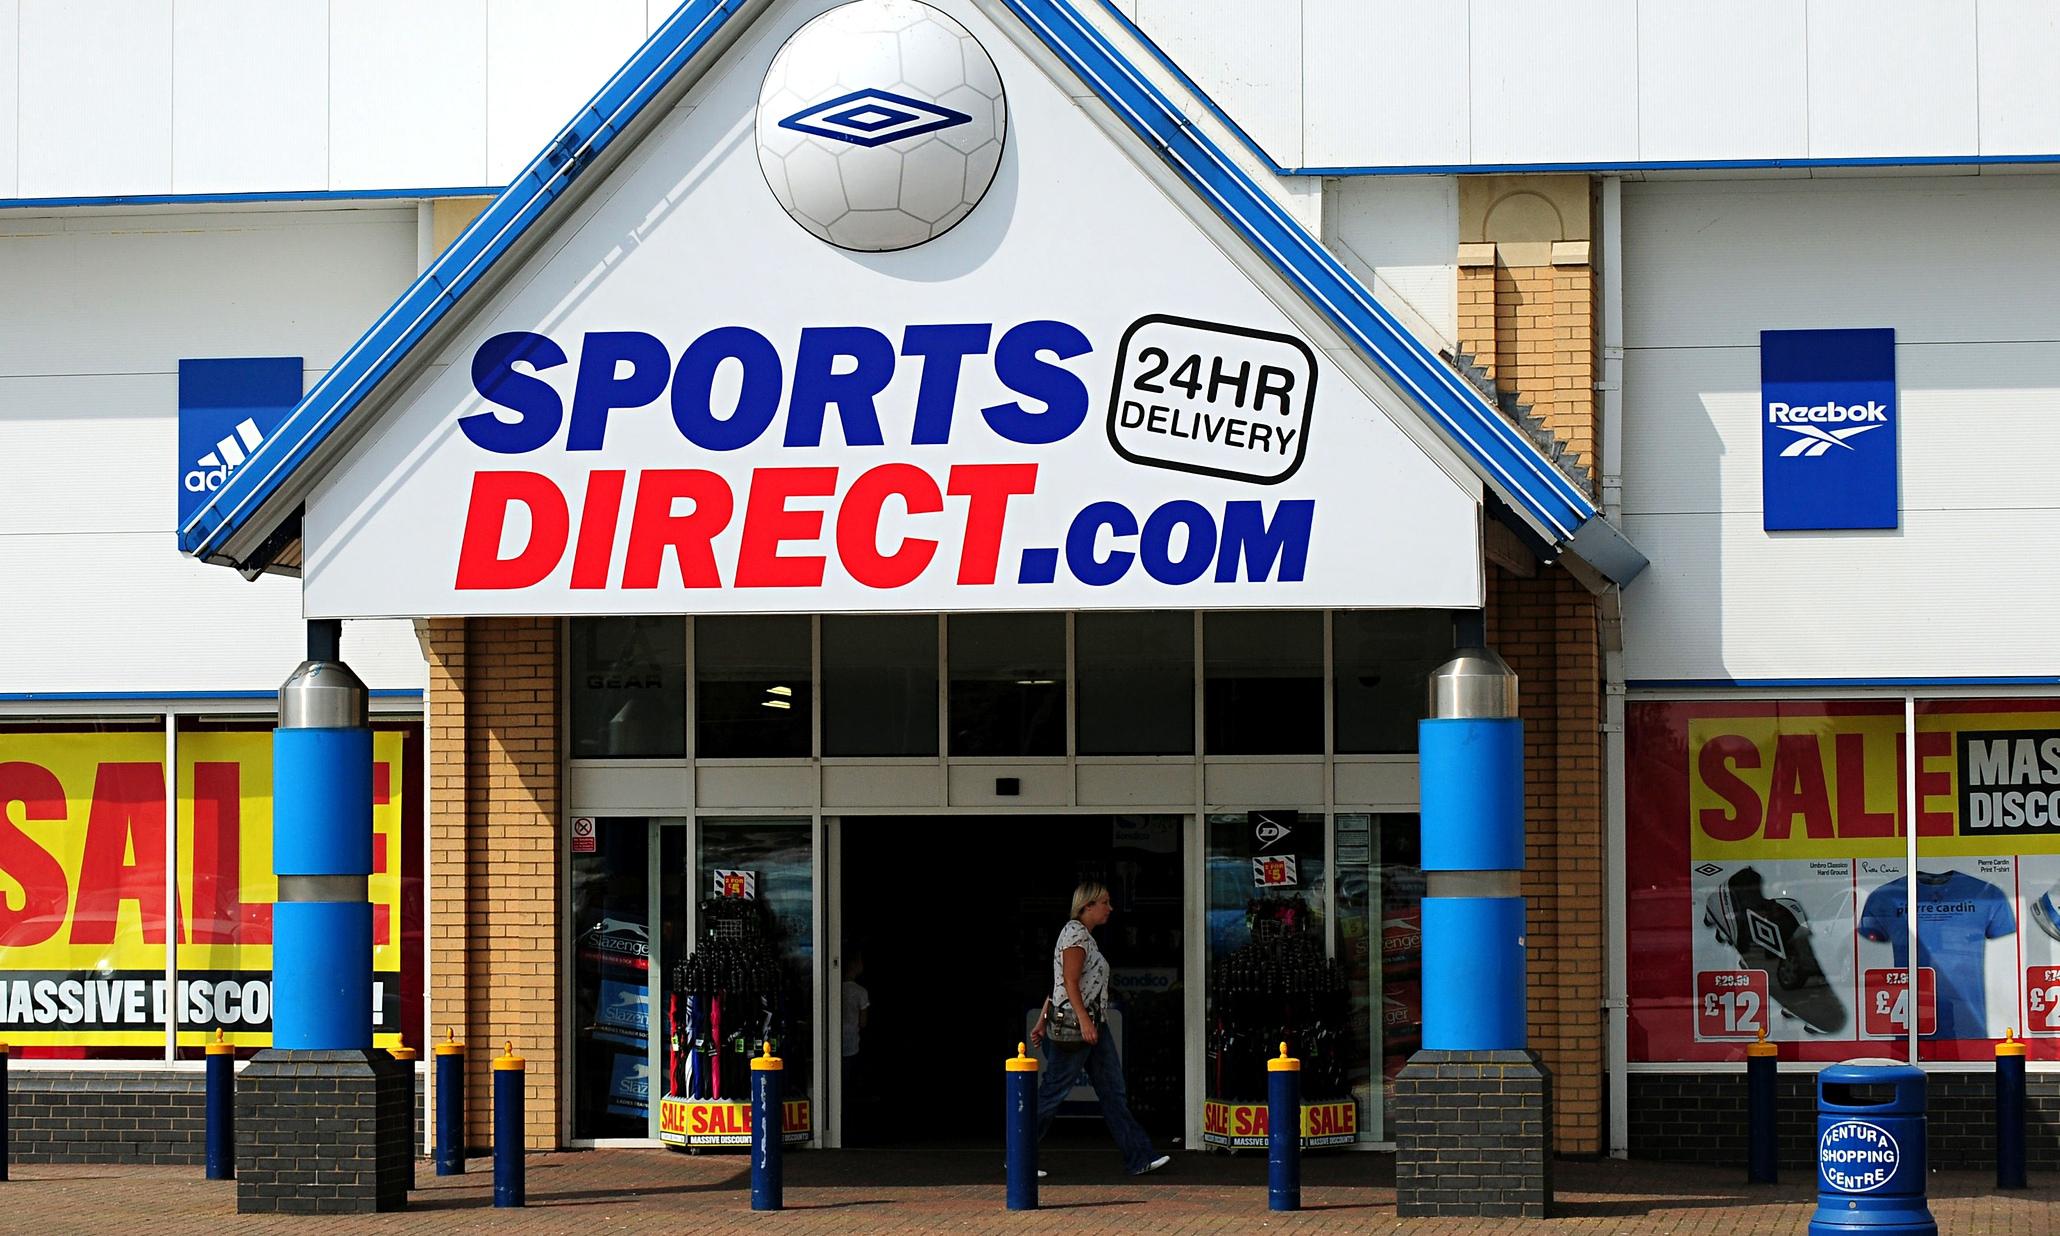 Direct Sports Ltd, Evolution, Wynyard Business Park, Wynyard, Stockton-on-Tees, TS22 5TB. Registered in England, No